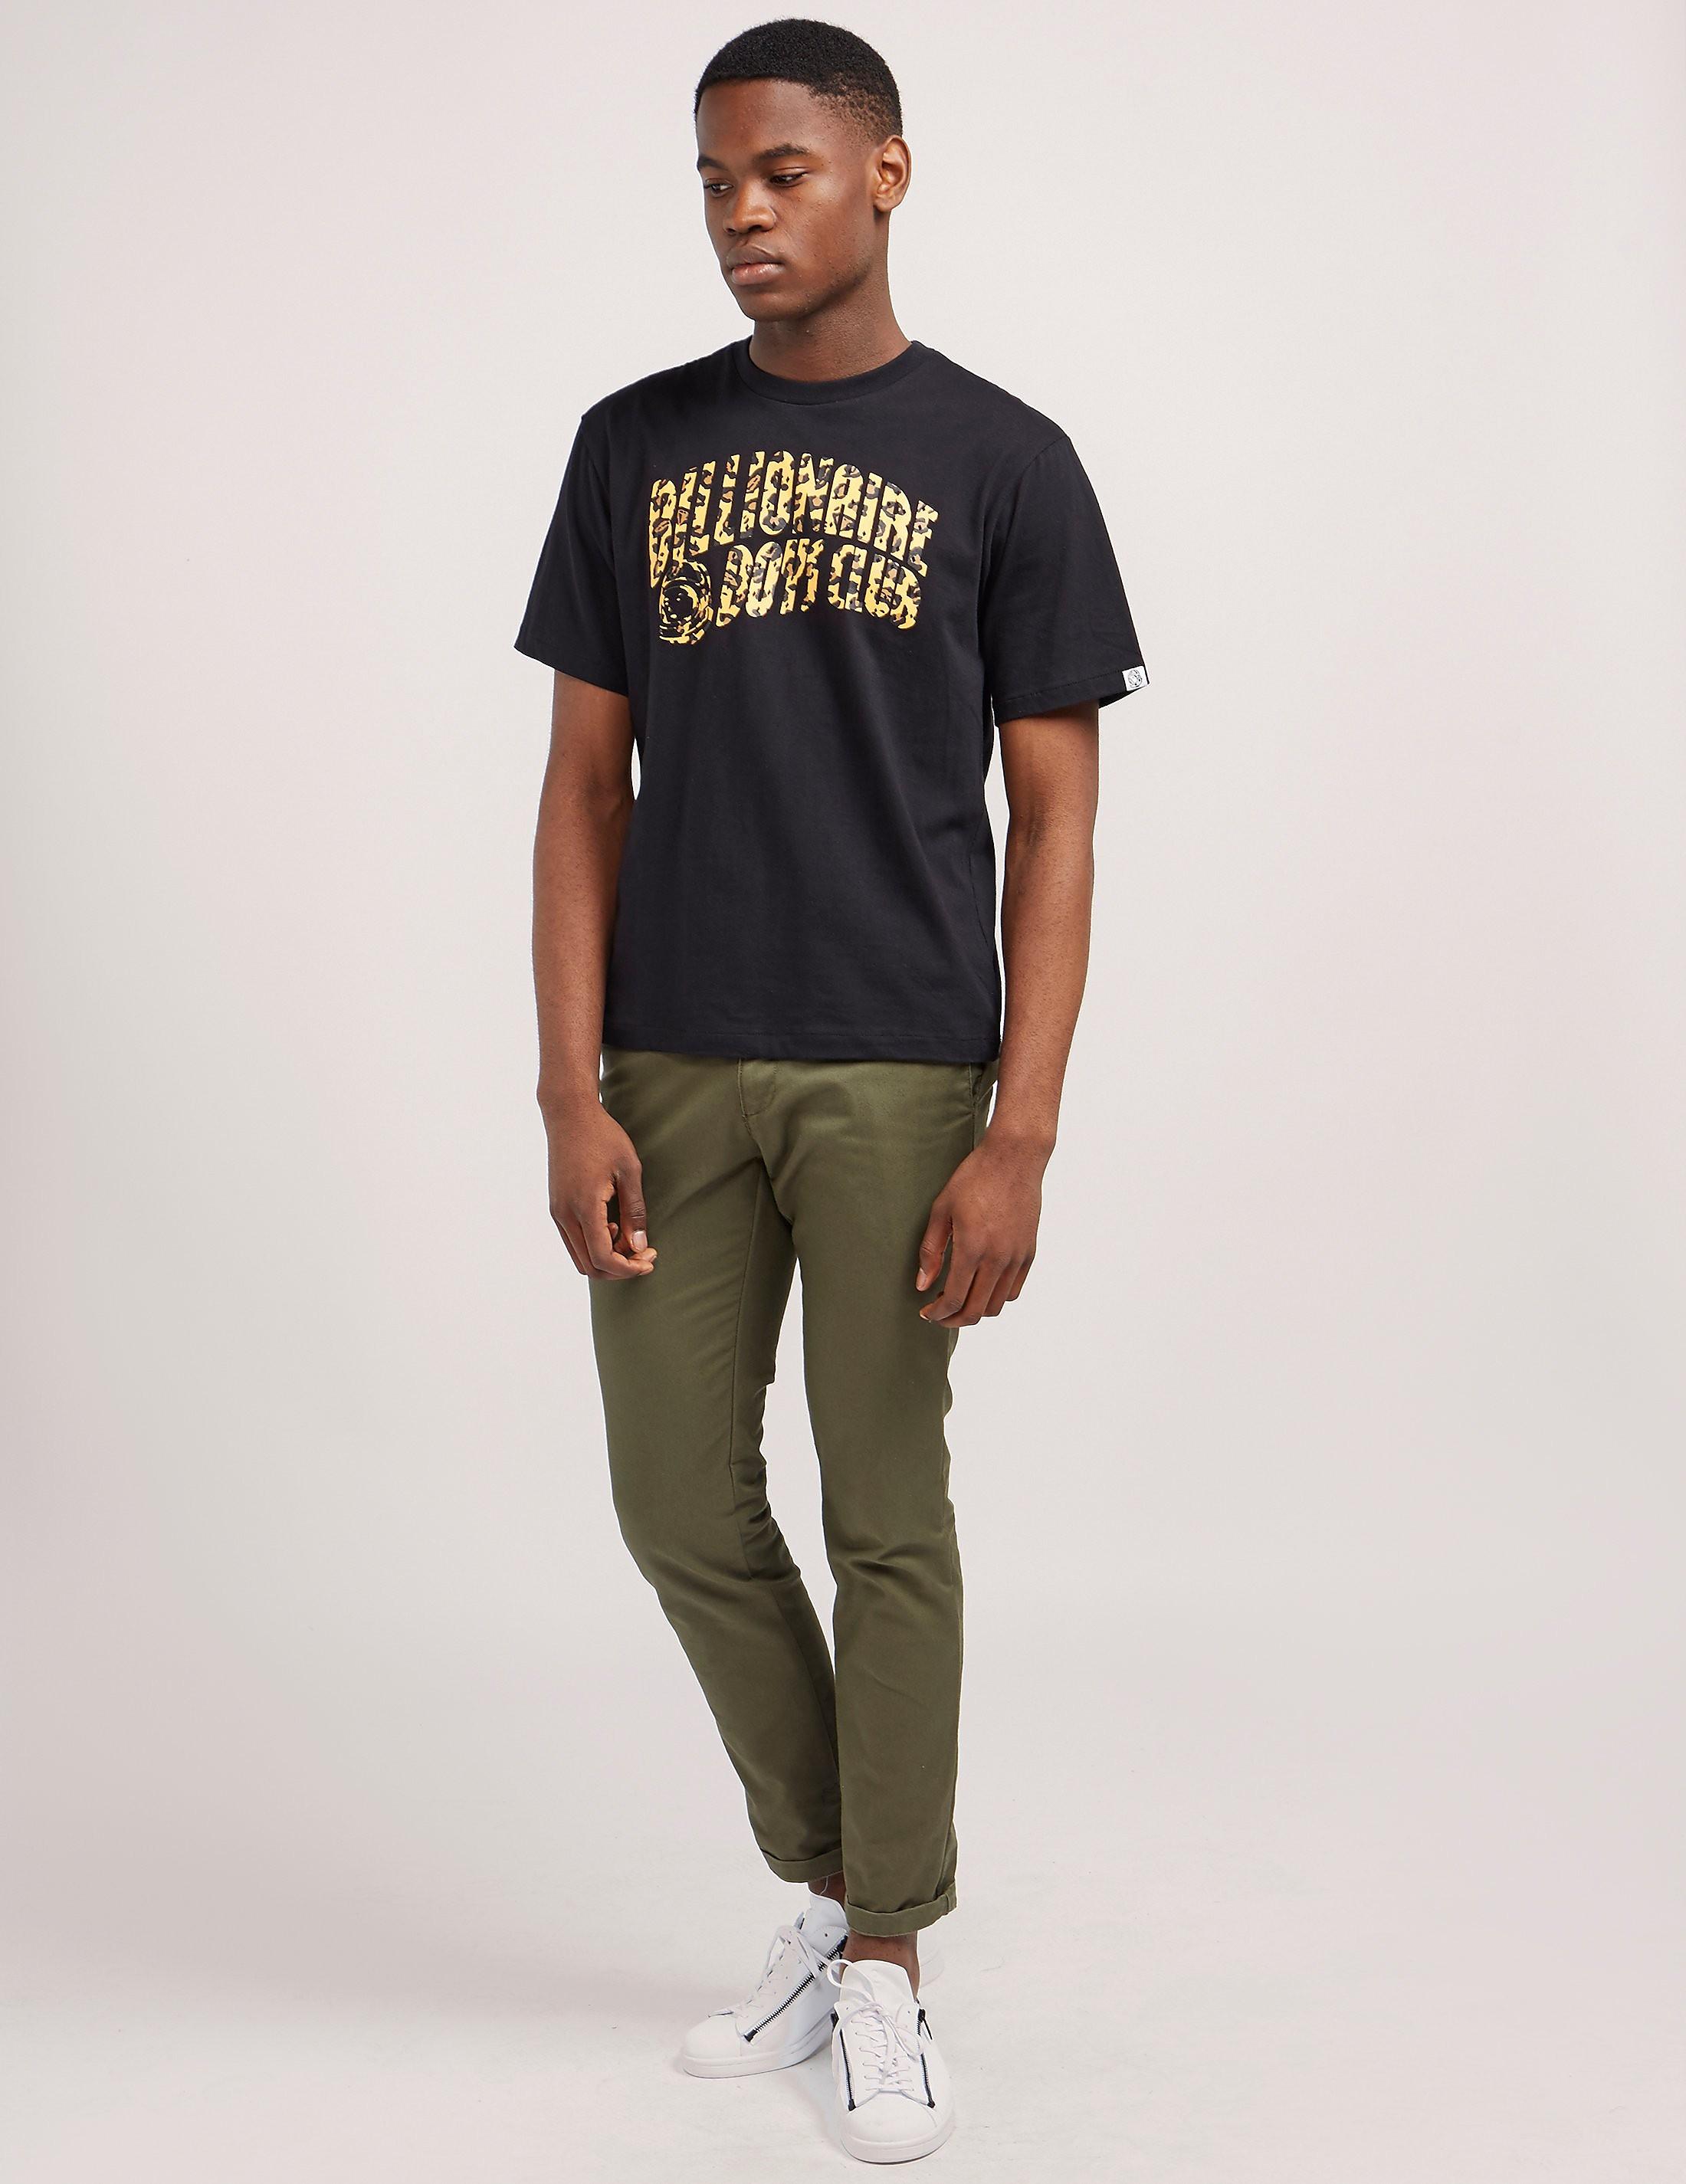 Billionaire Boys Club Leopard Arch Short Sleeve T-Shirt